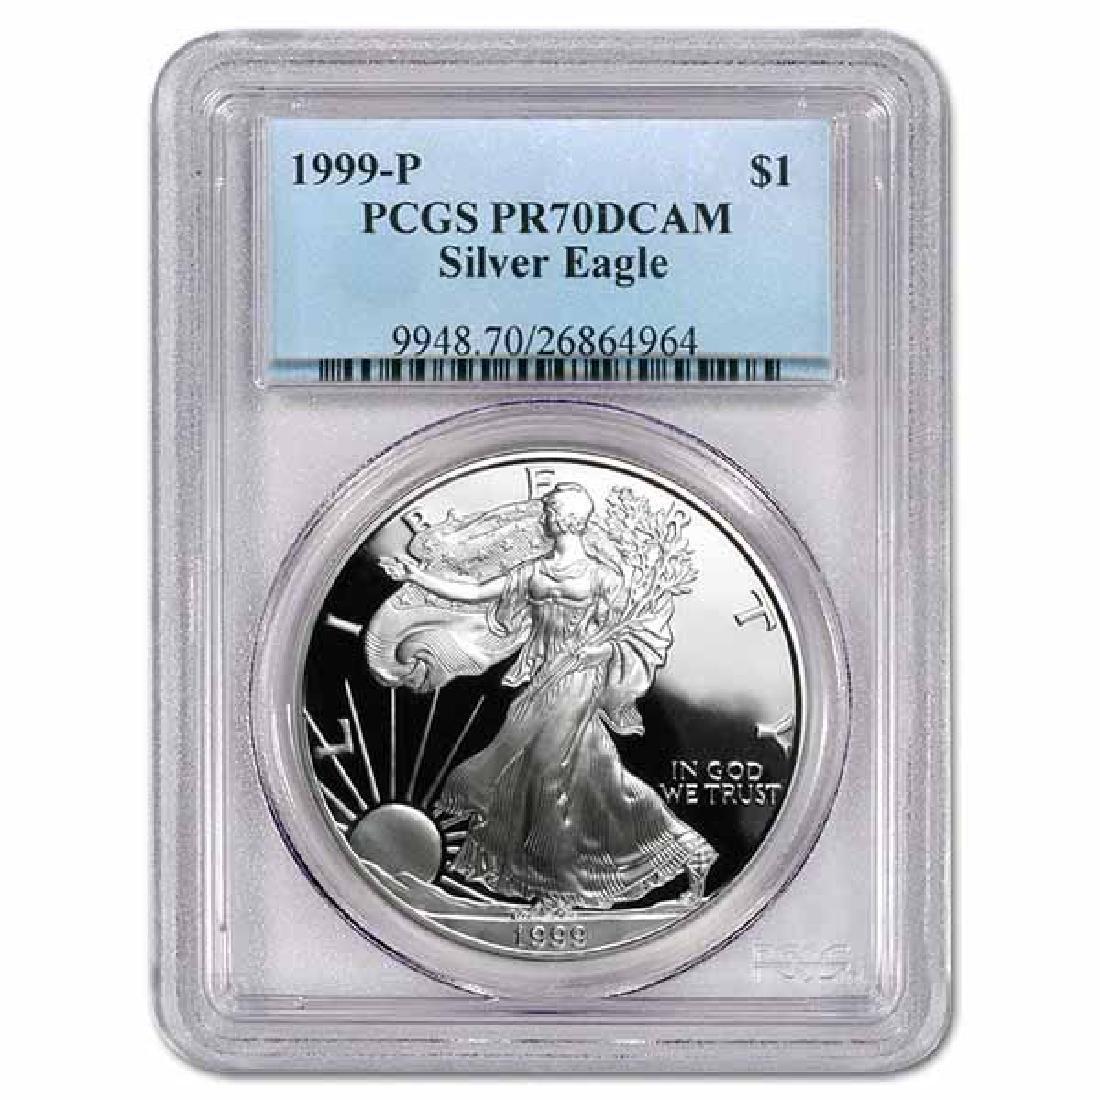 Certified Proof Silver Eagle 1999-P PR70DCAM PCGS